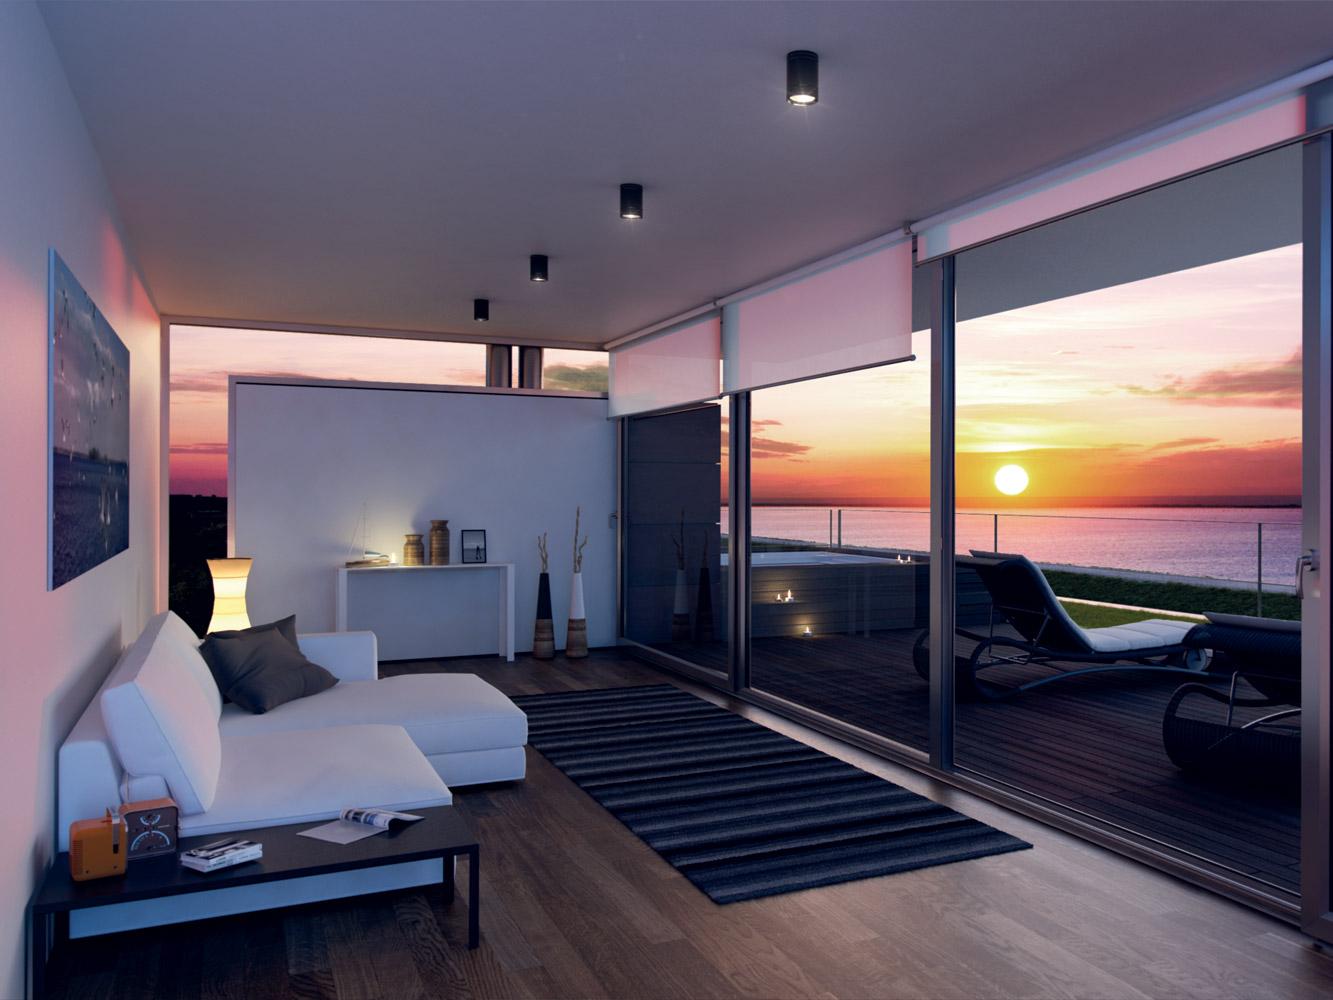 Villa e soleis for residence luxury resort in italy for Ville moderne con vetrate